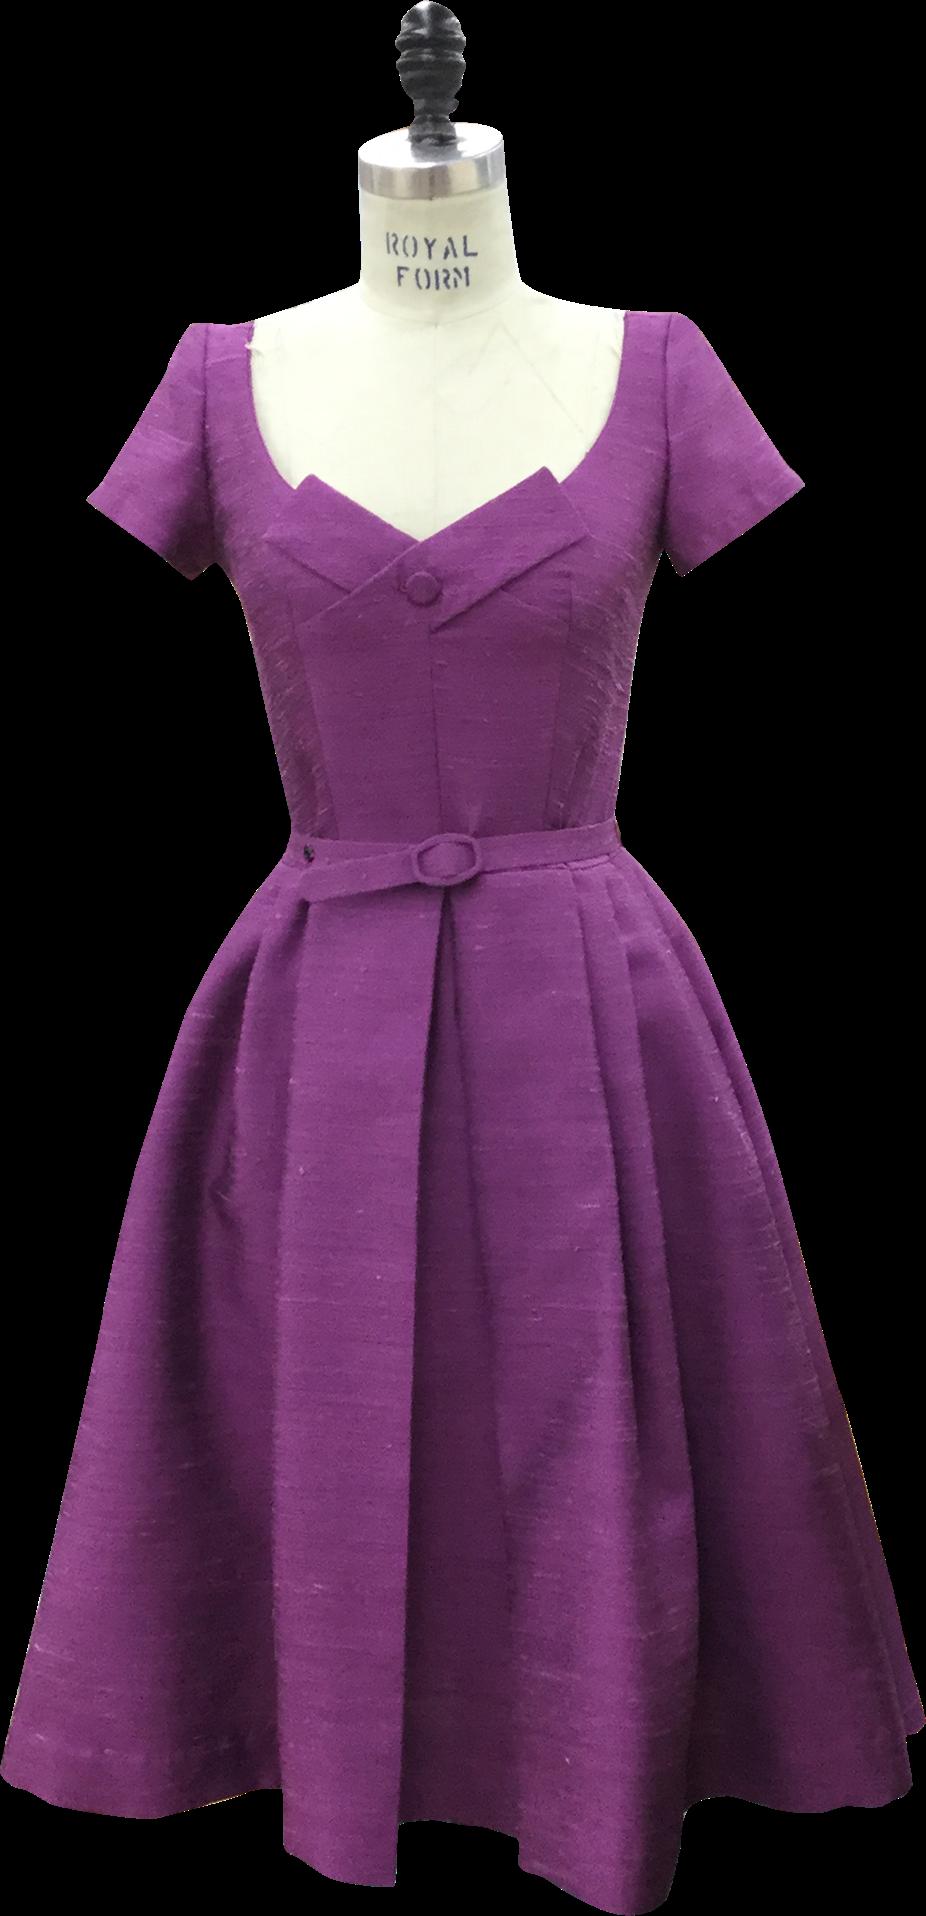 The Marvelous Mrs. Maisel purple dress on mannequin